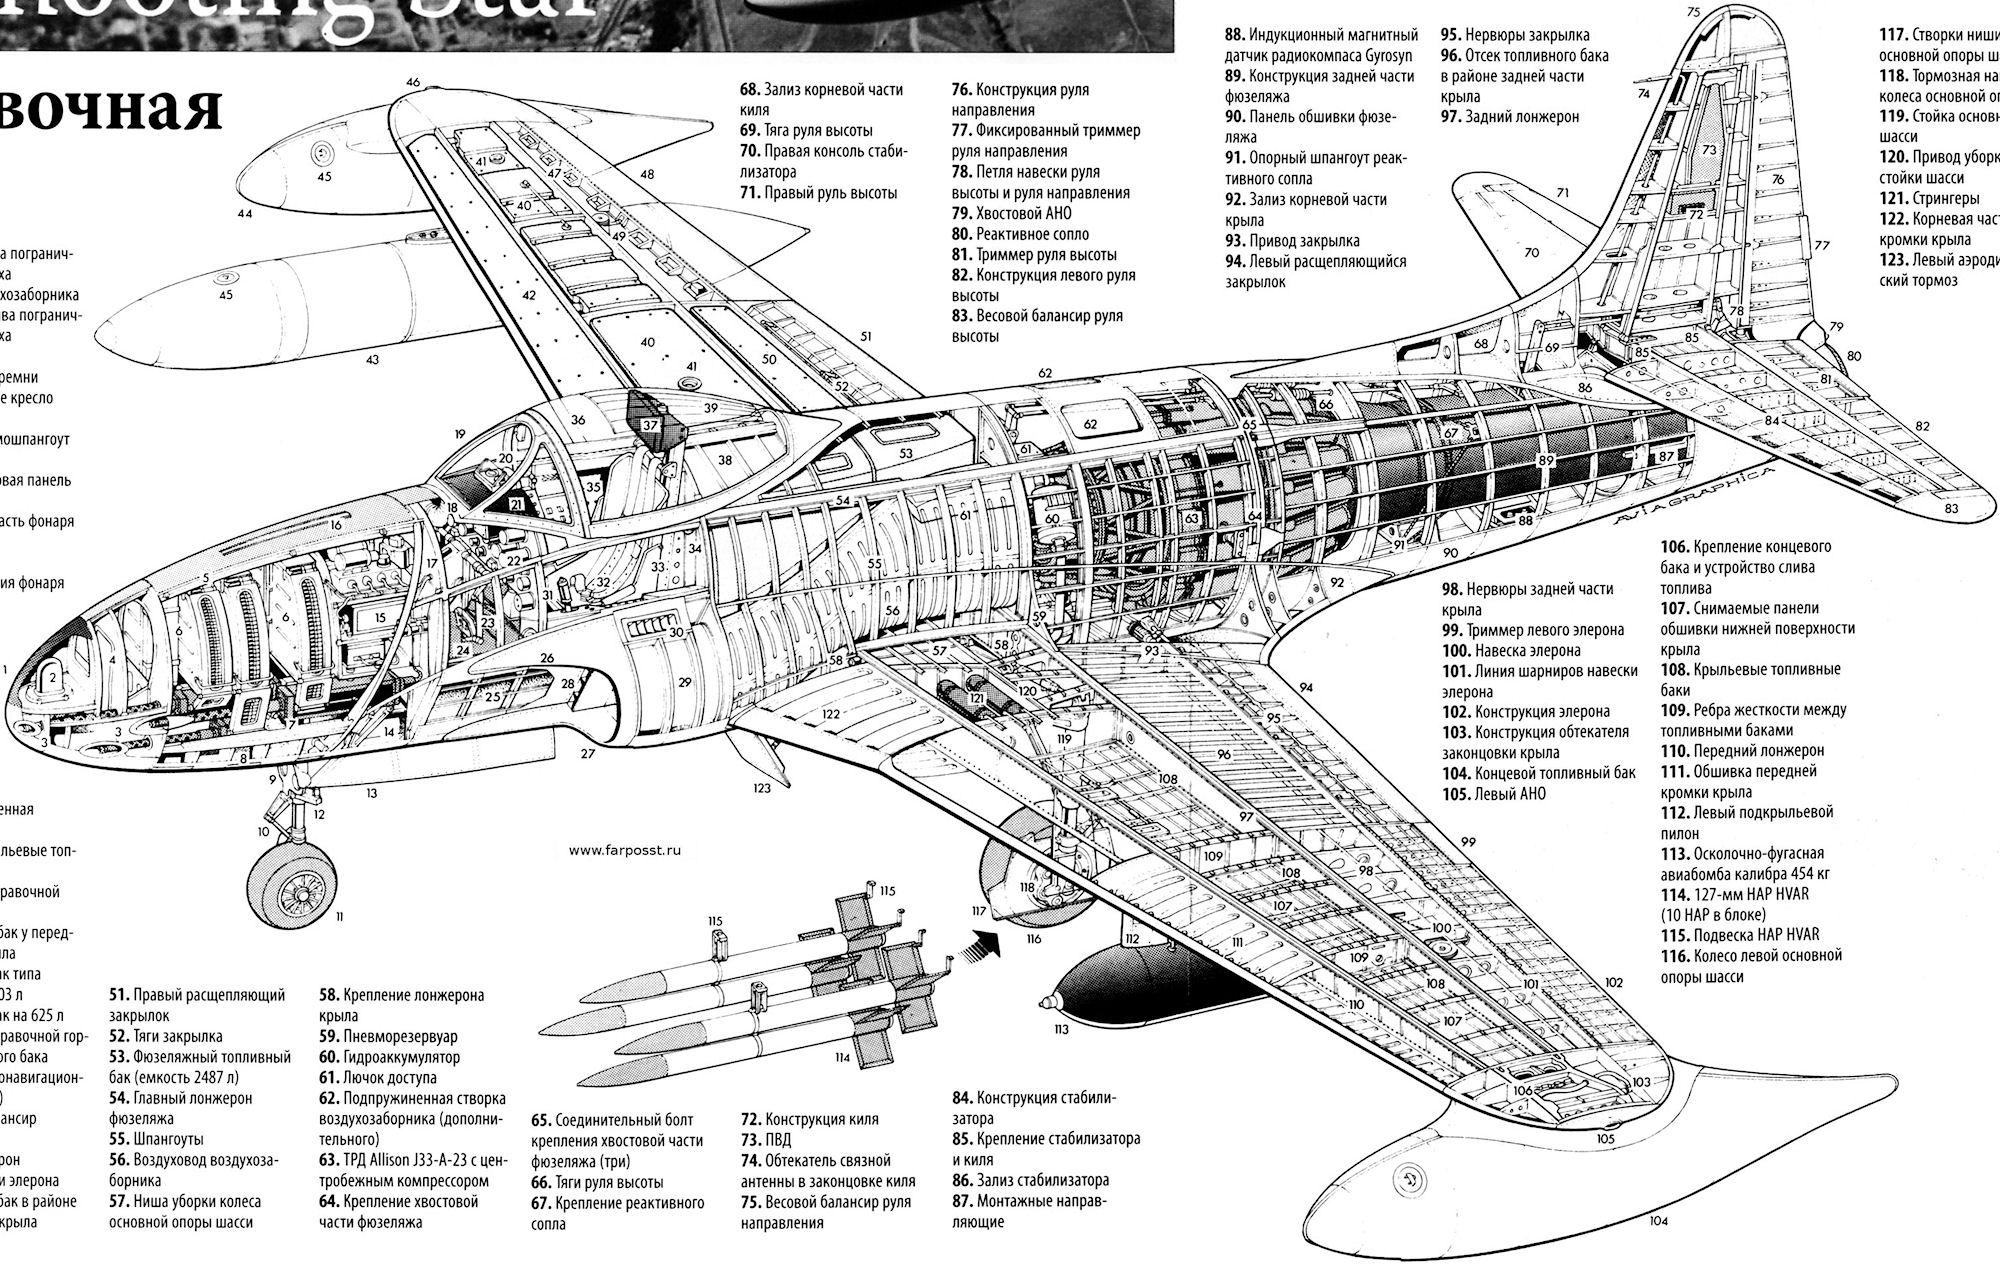 Lockheed P-80 Shooting Star: aviadejavu.ru/Site/Crafts/Craft20142-6.htm